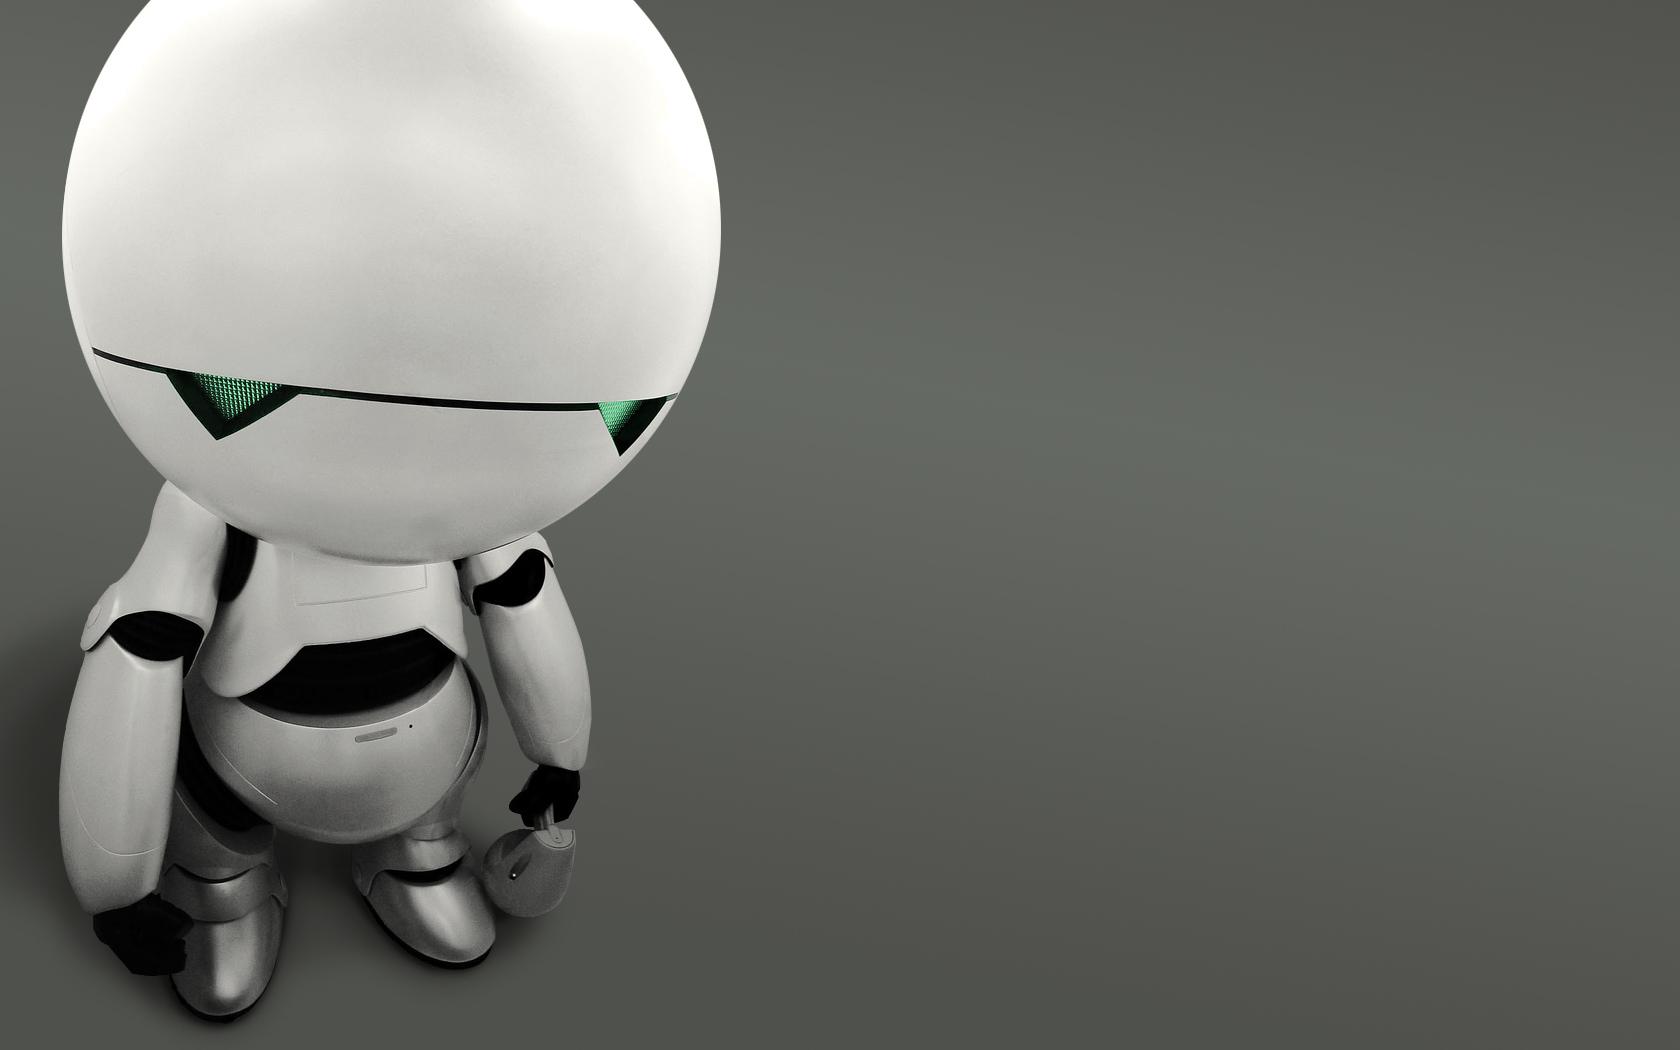 Hd wallpaper robot - Wallpapers Hd Robots Taringa